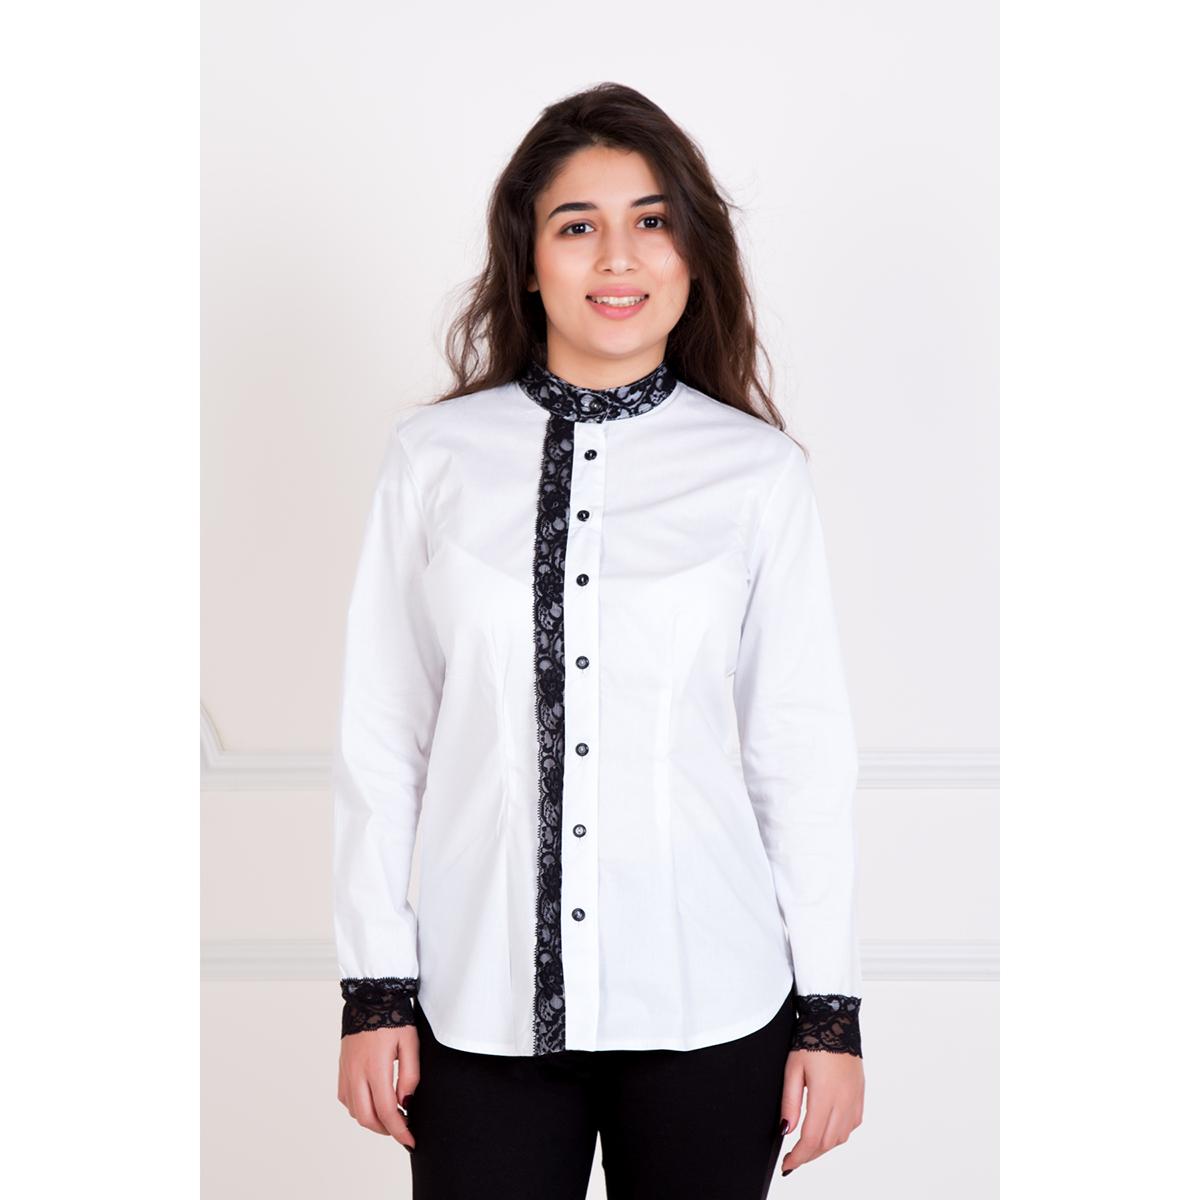 Женская рубашка Владлена, размер 50Рубашки<br>Обхват груди: 100 см <br>Обхват талии: 82 см <br>Обхват бедер: 108 см <br>Рост: 167 см<br><br>Тип: Жен. рубашка<br>Размер: 50<br>Материал: Хлопок